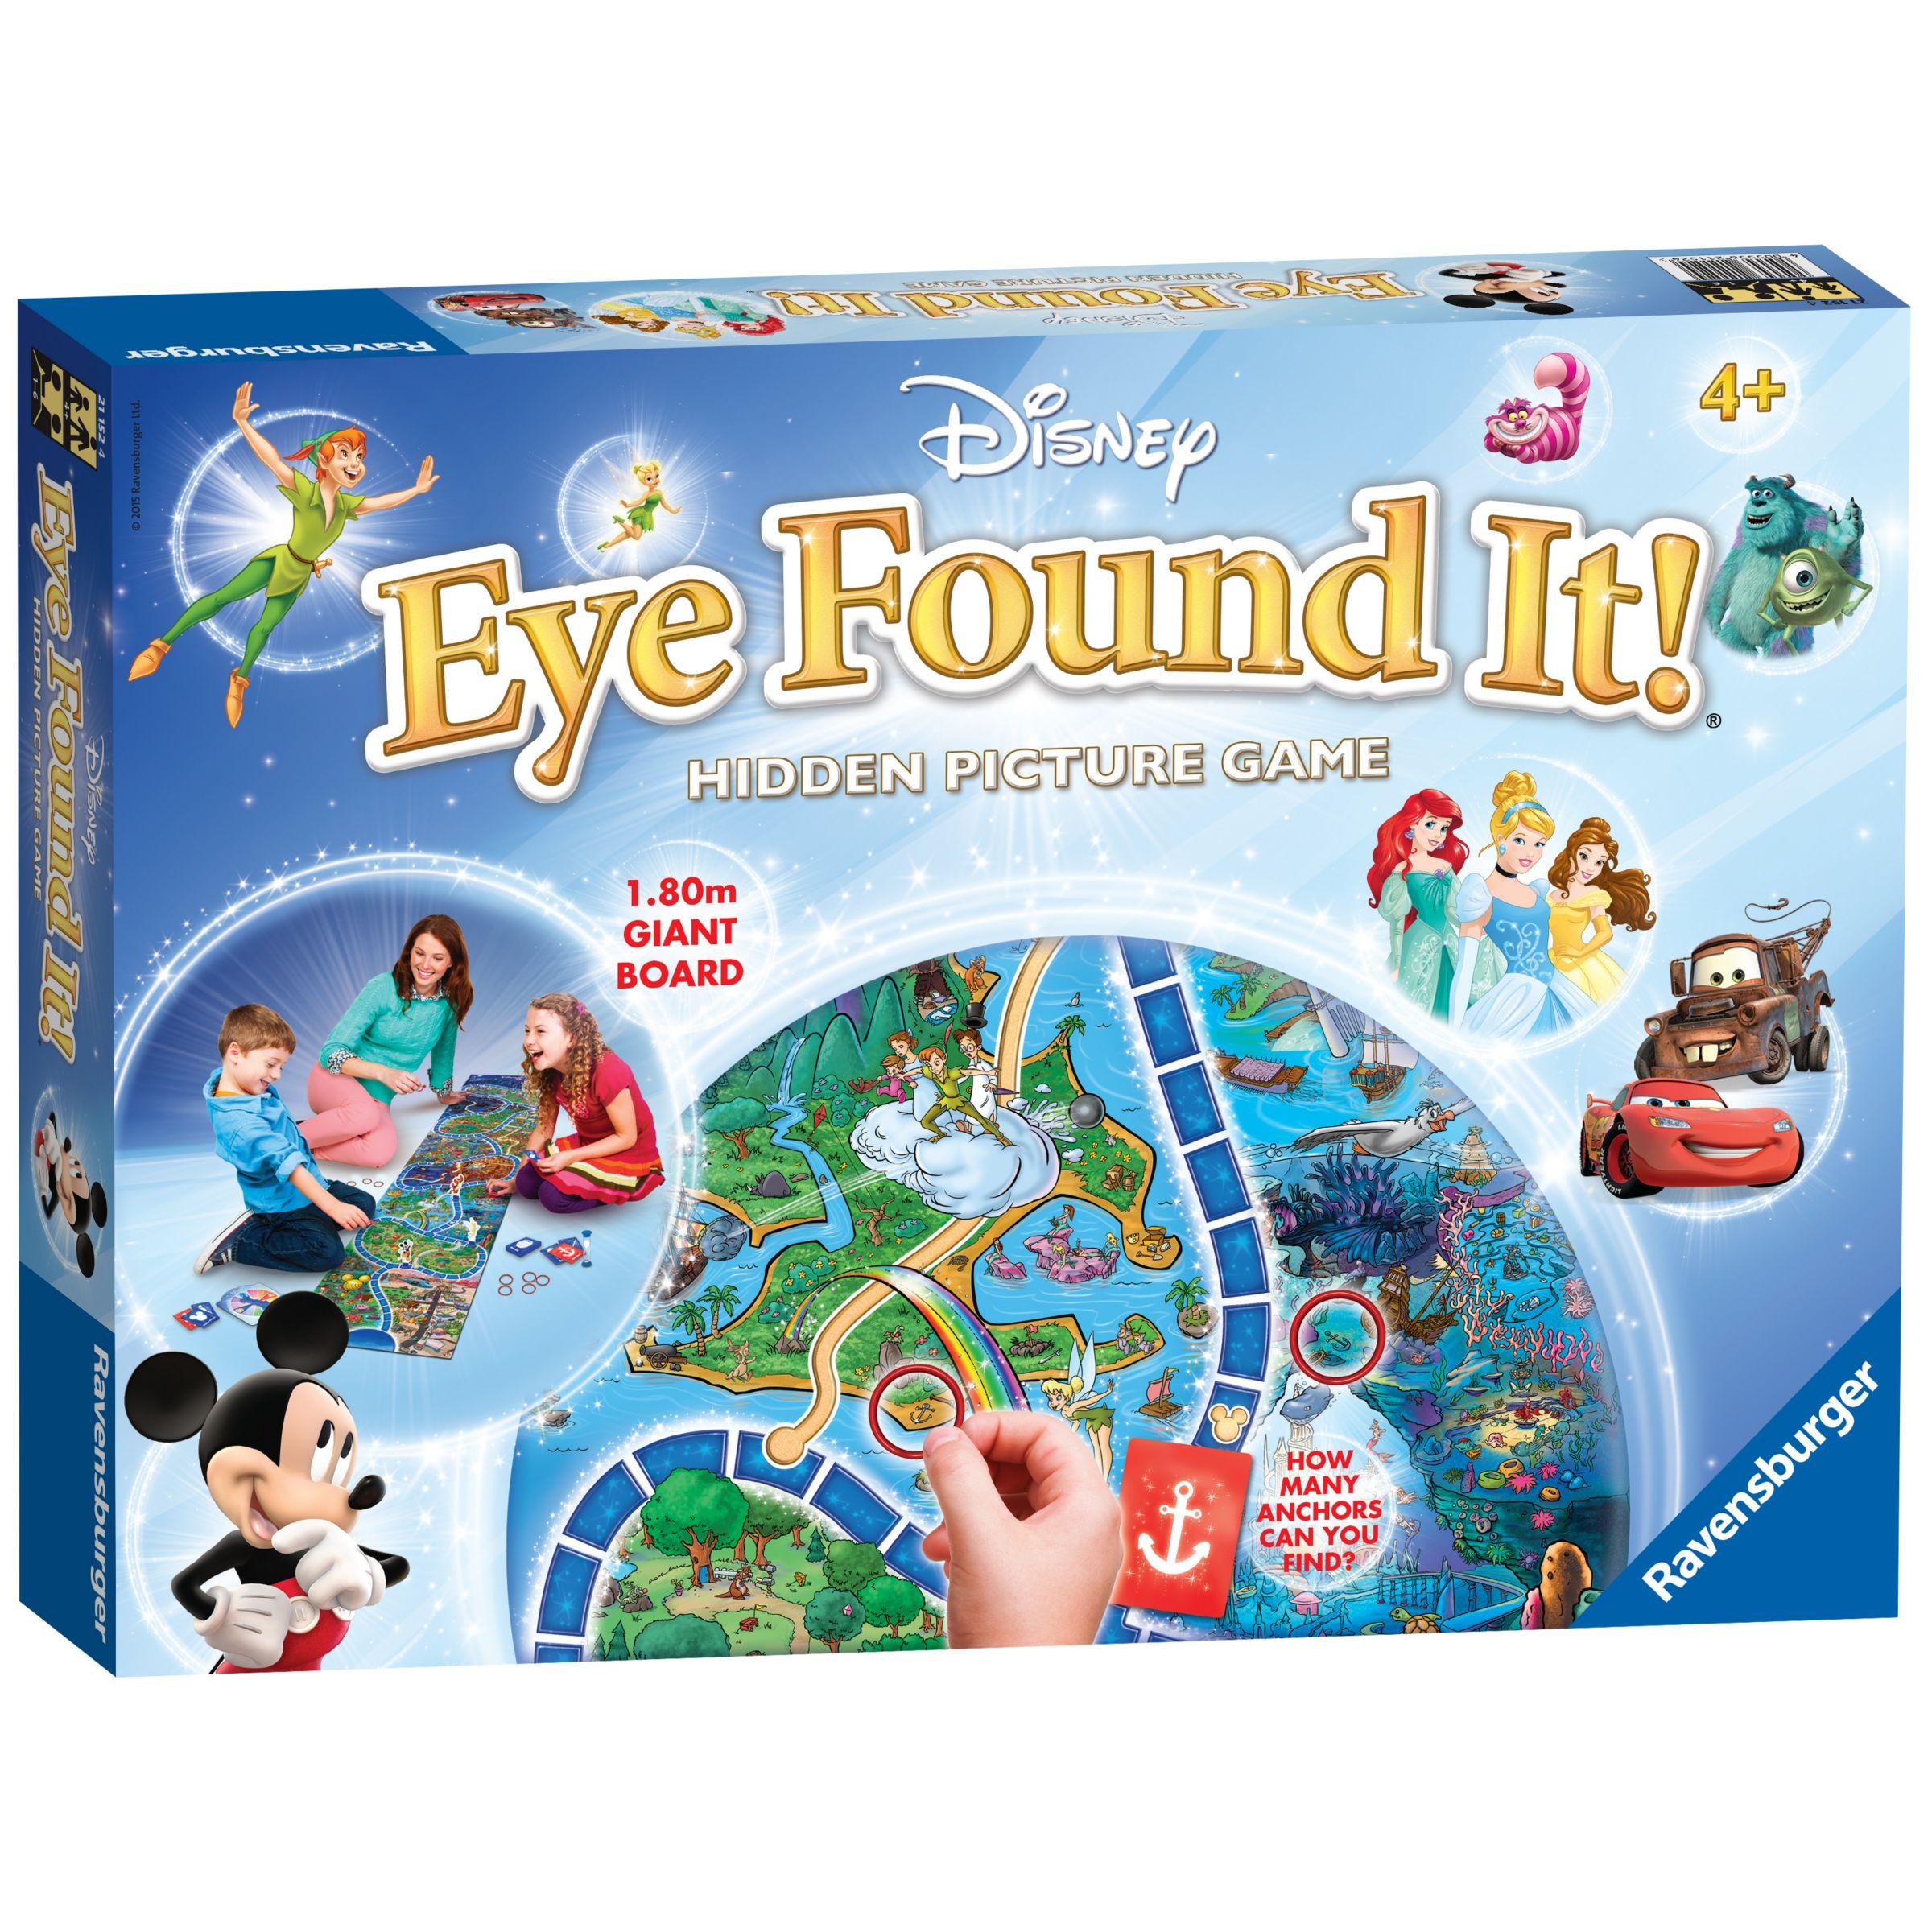 Ravensburger Ravensburger Disney Eye Found It! Game